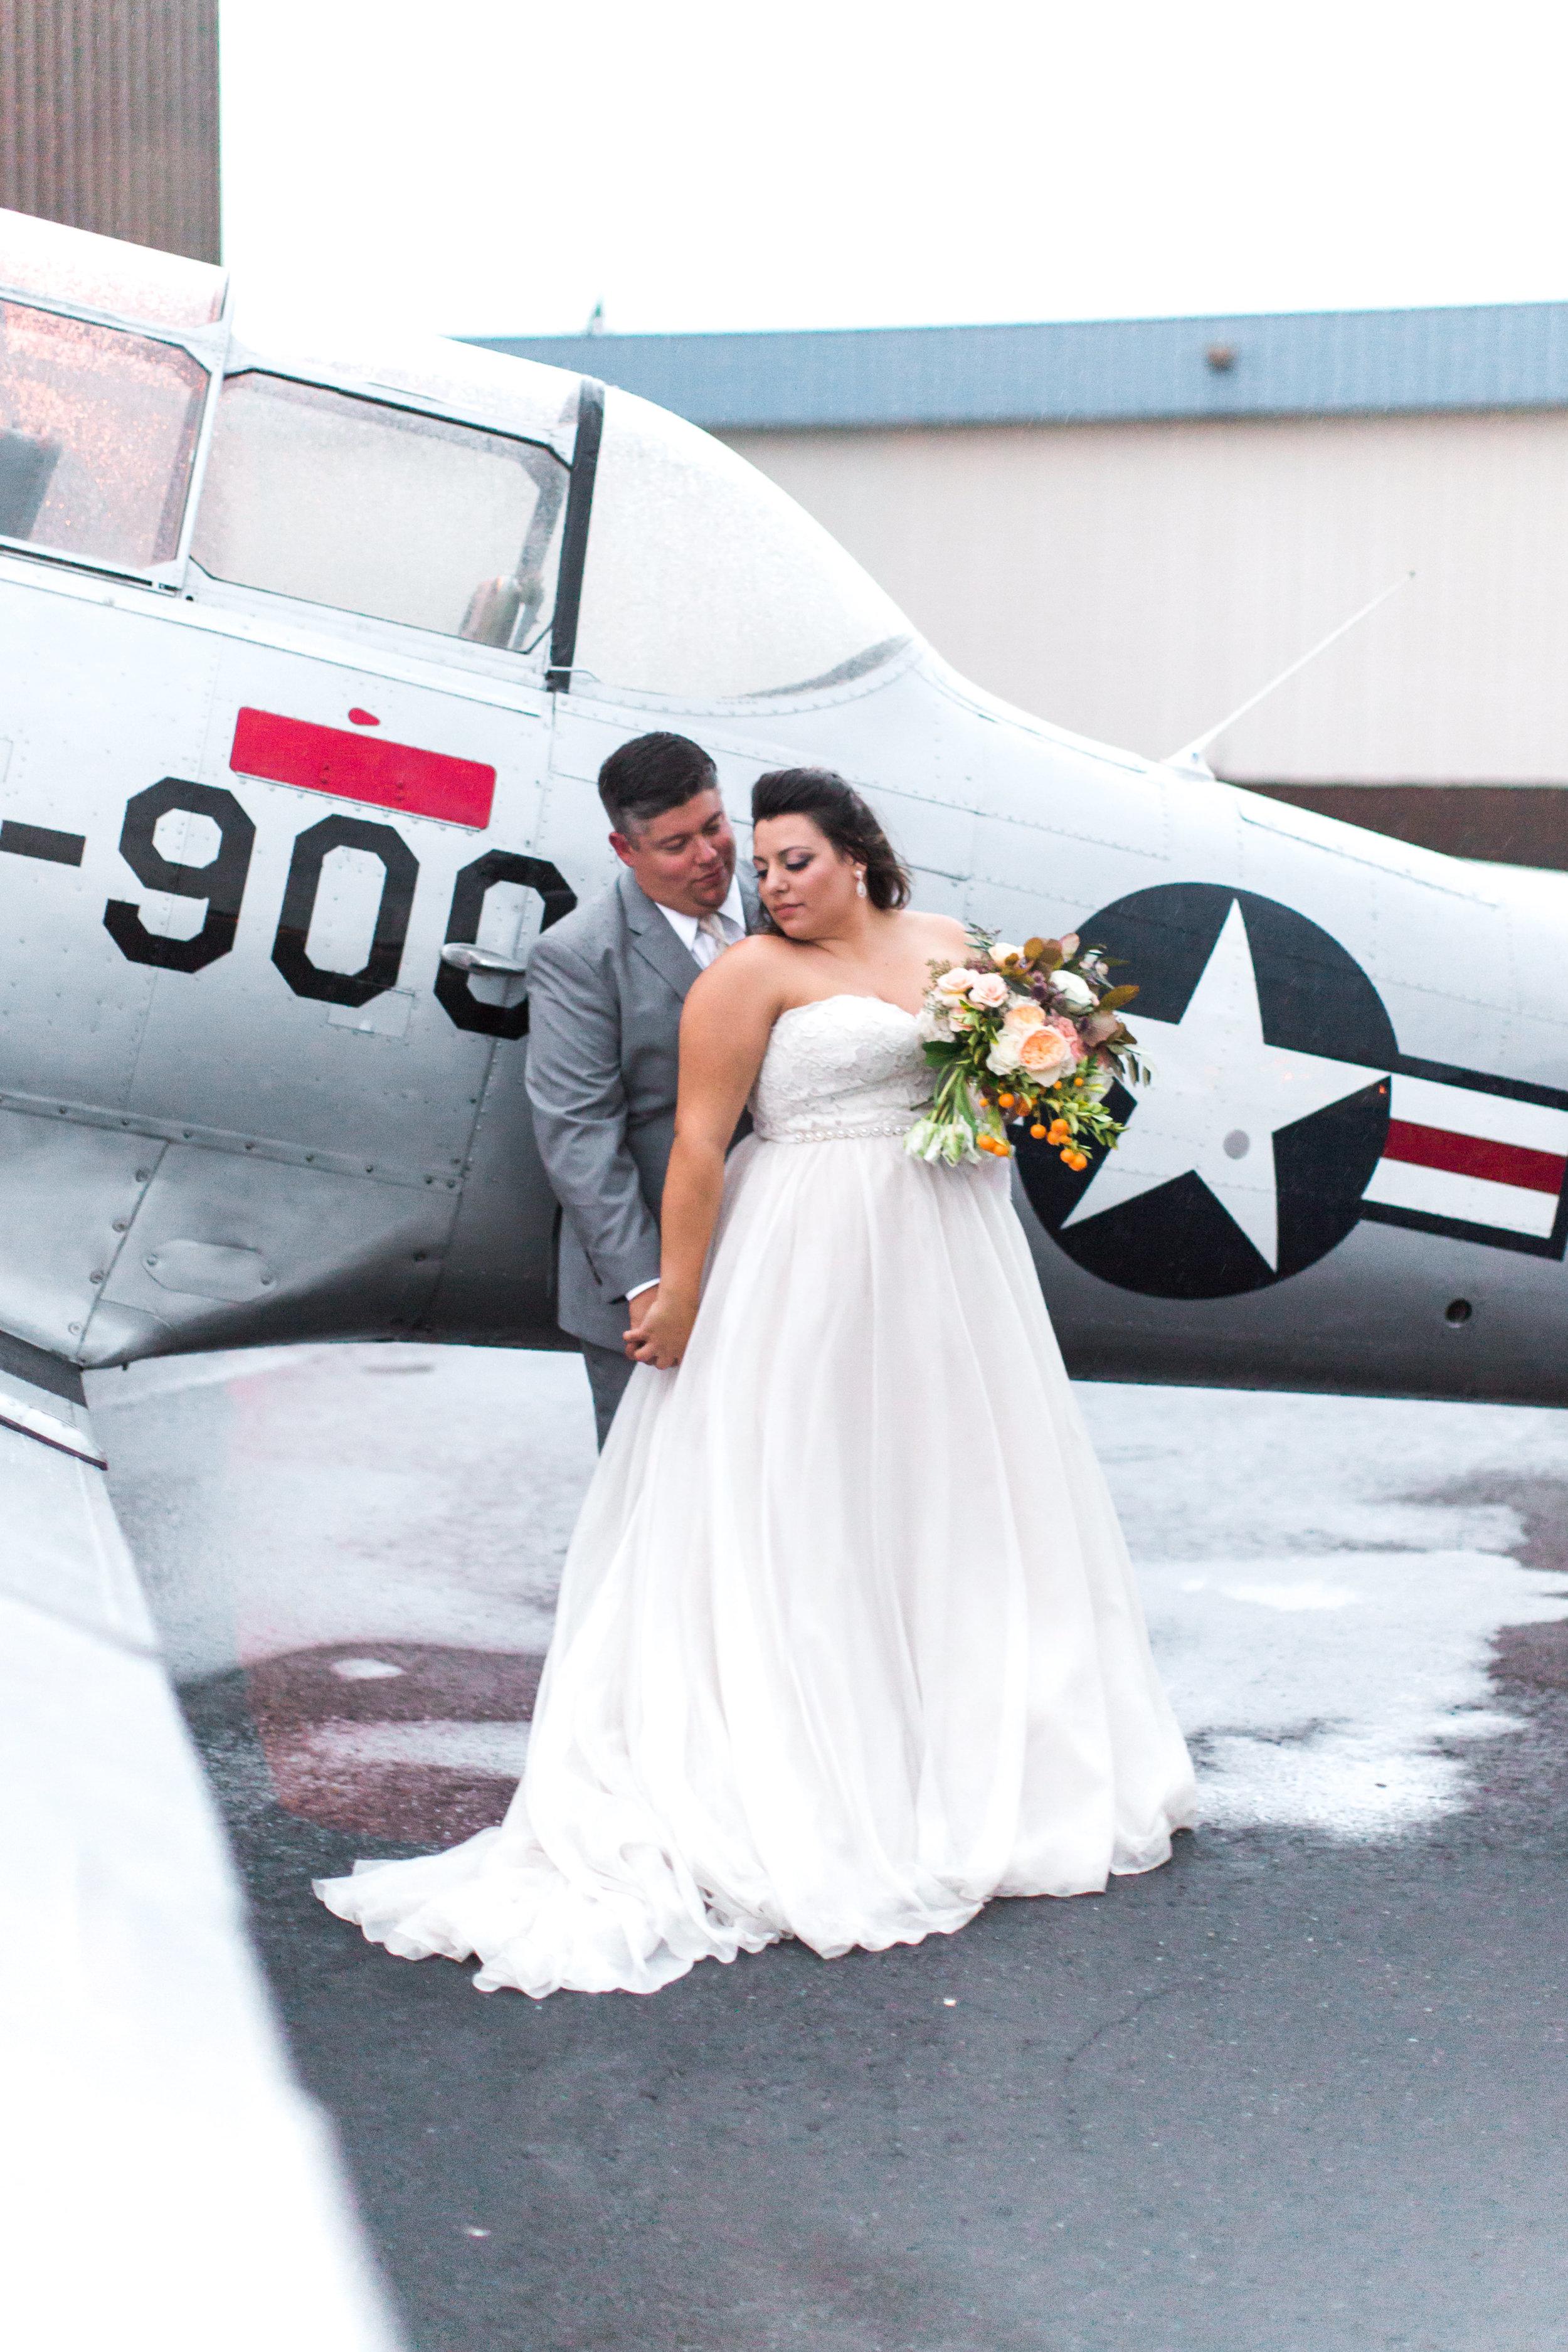 airport-hanger-wedding-at-attitude-aviation-in-livermore-119.jpg